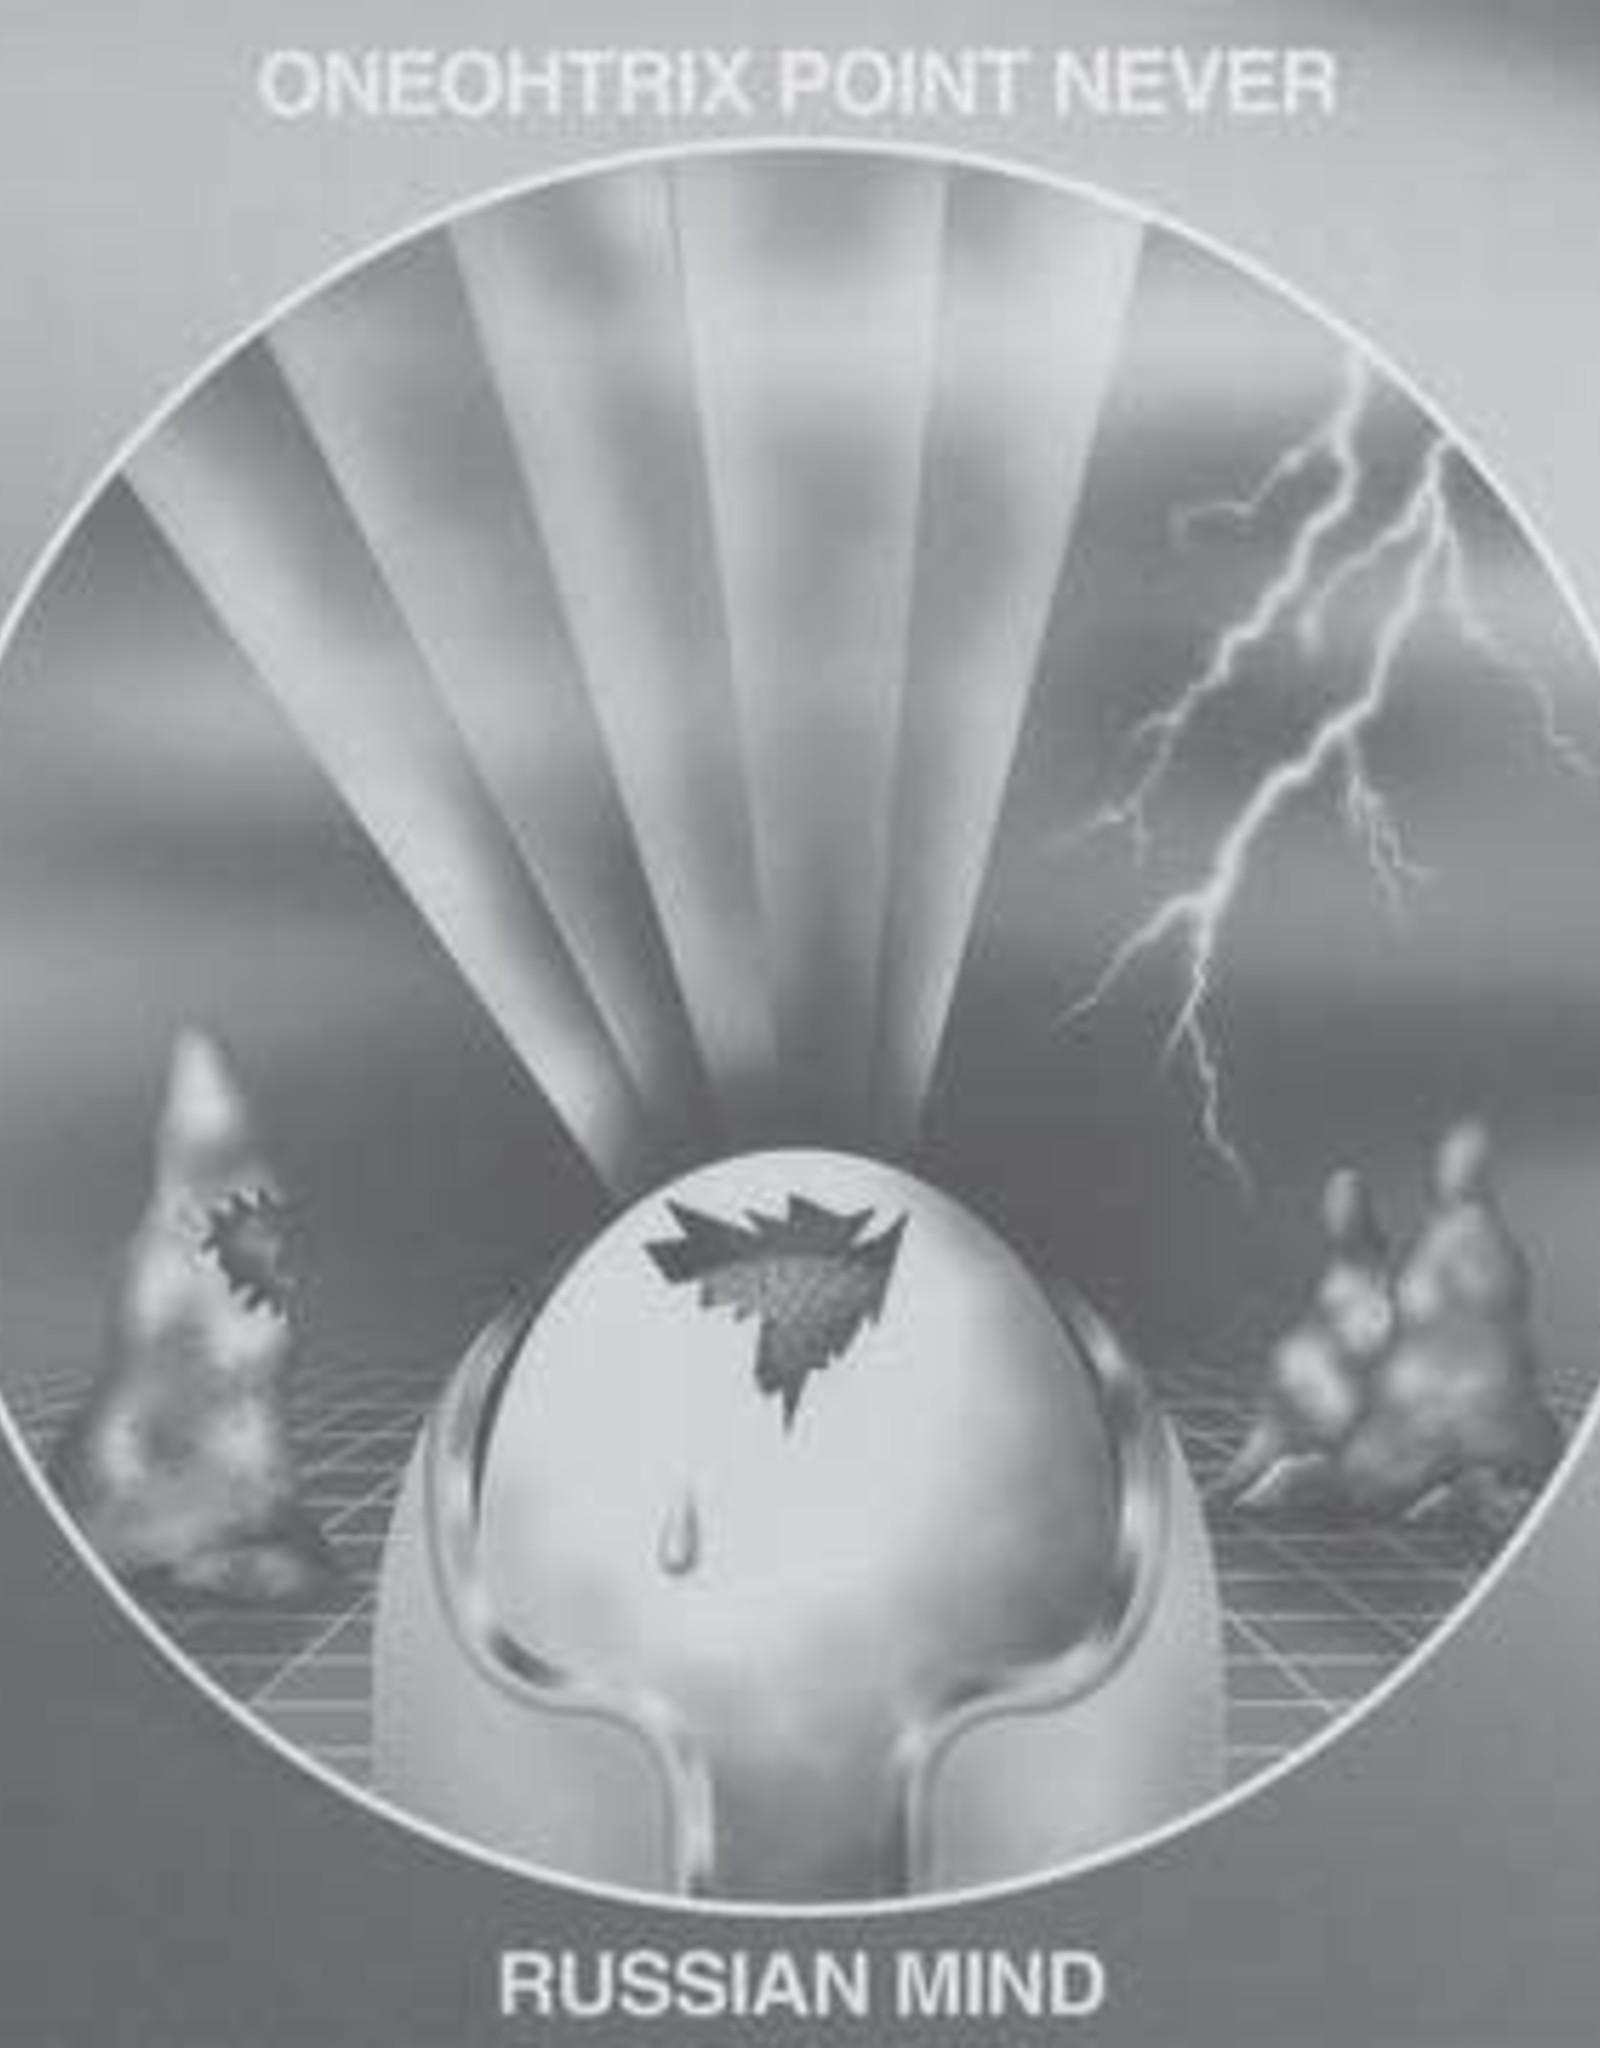 Oneohtrix Point Never - Russian Mind (Metallic Silver Vinyl) (RSD 6/21)